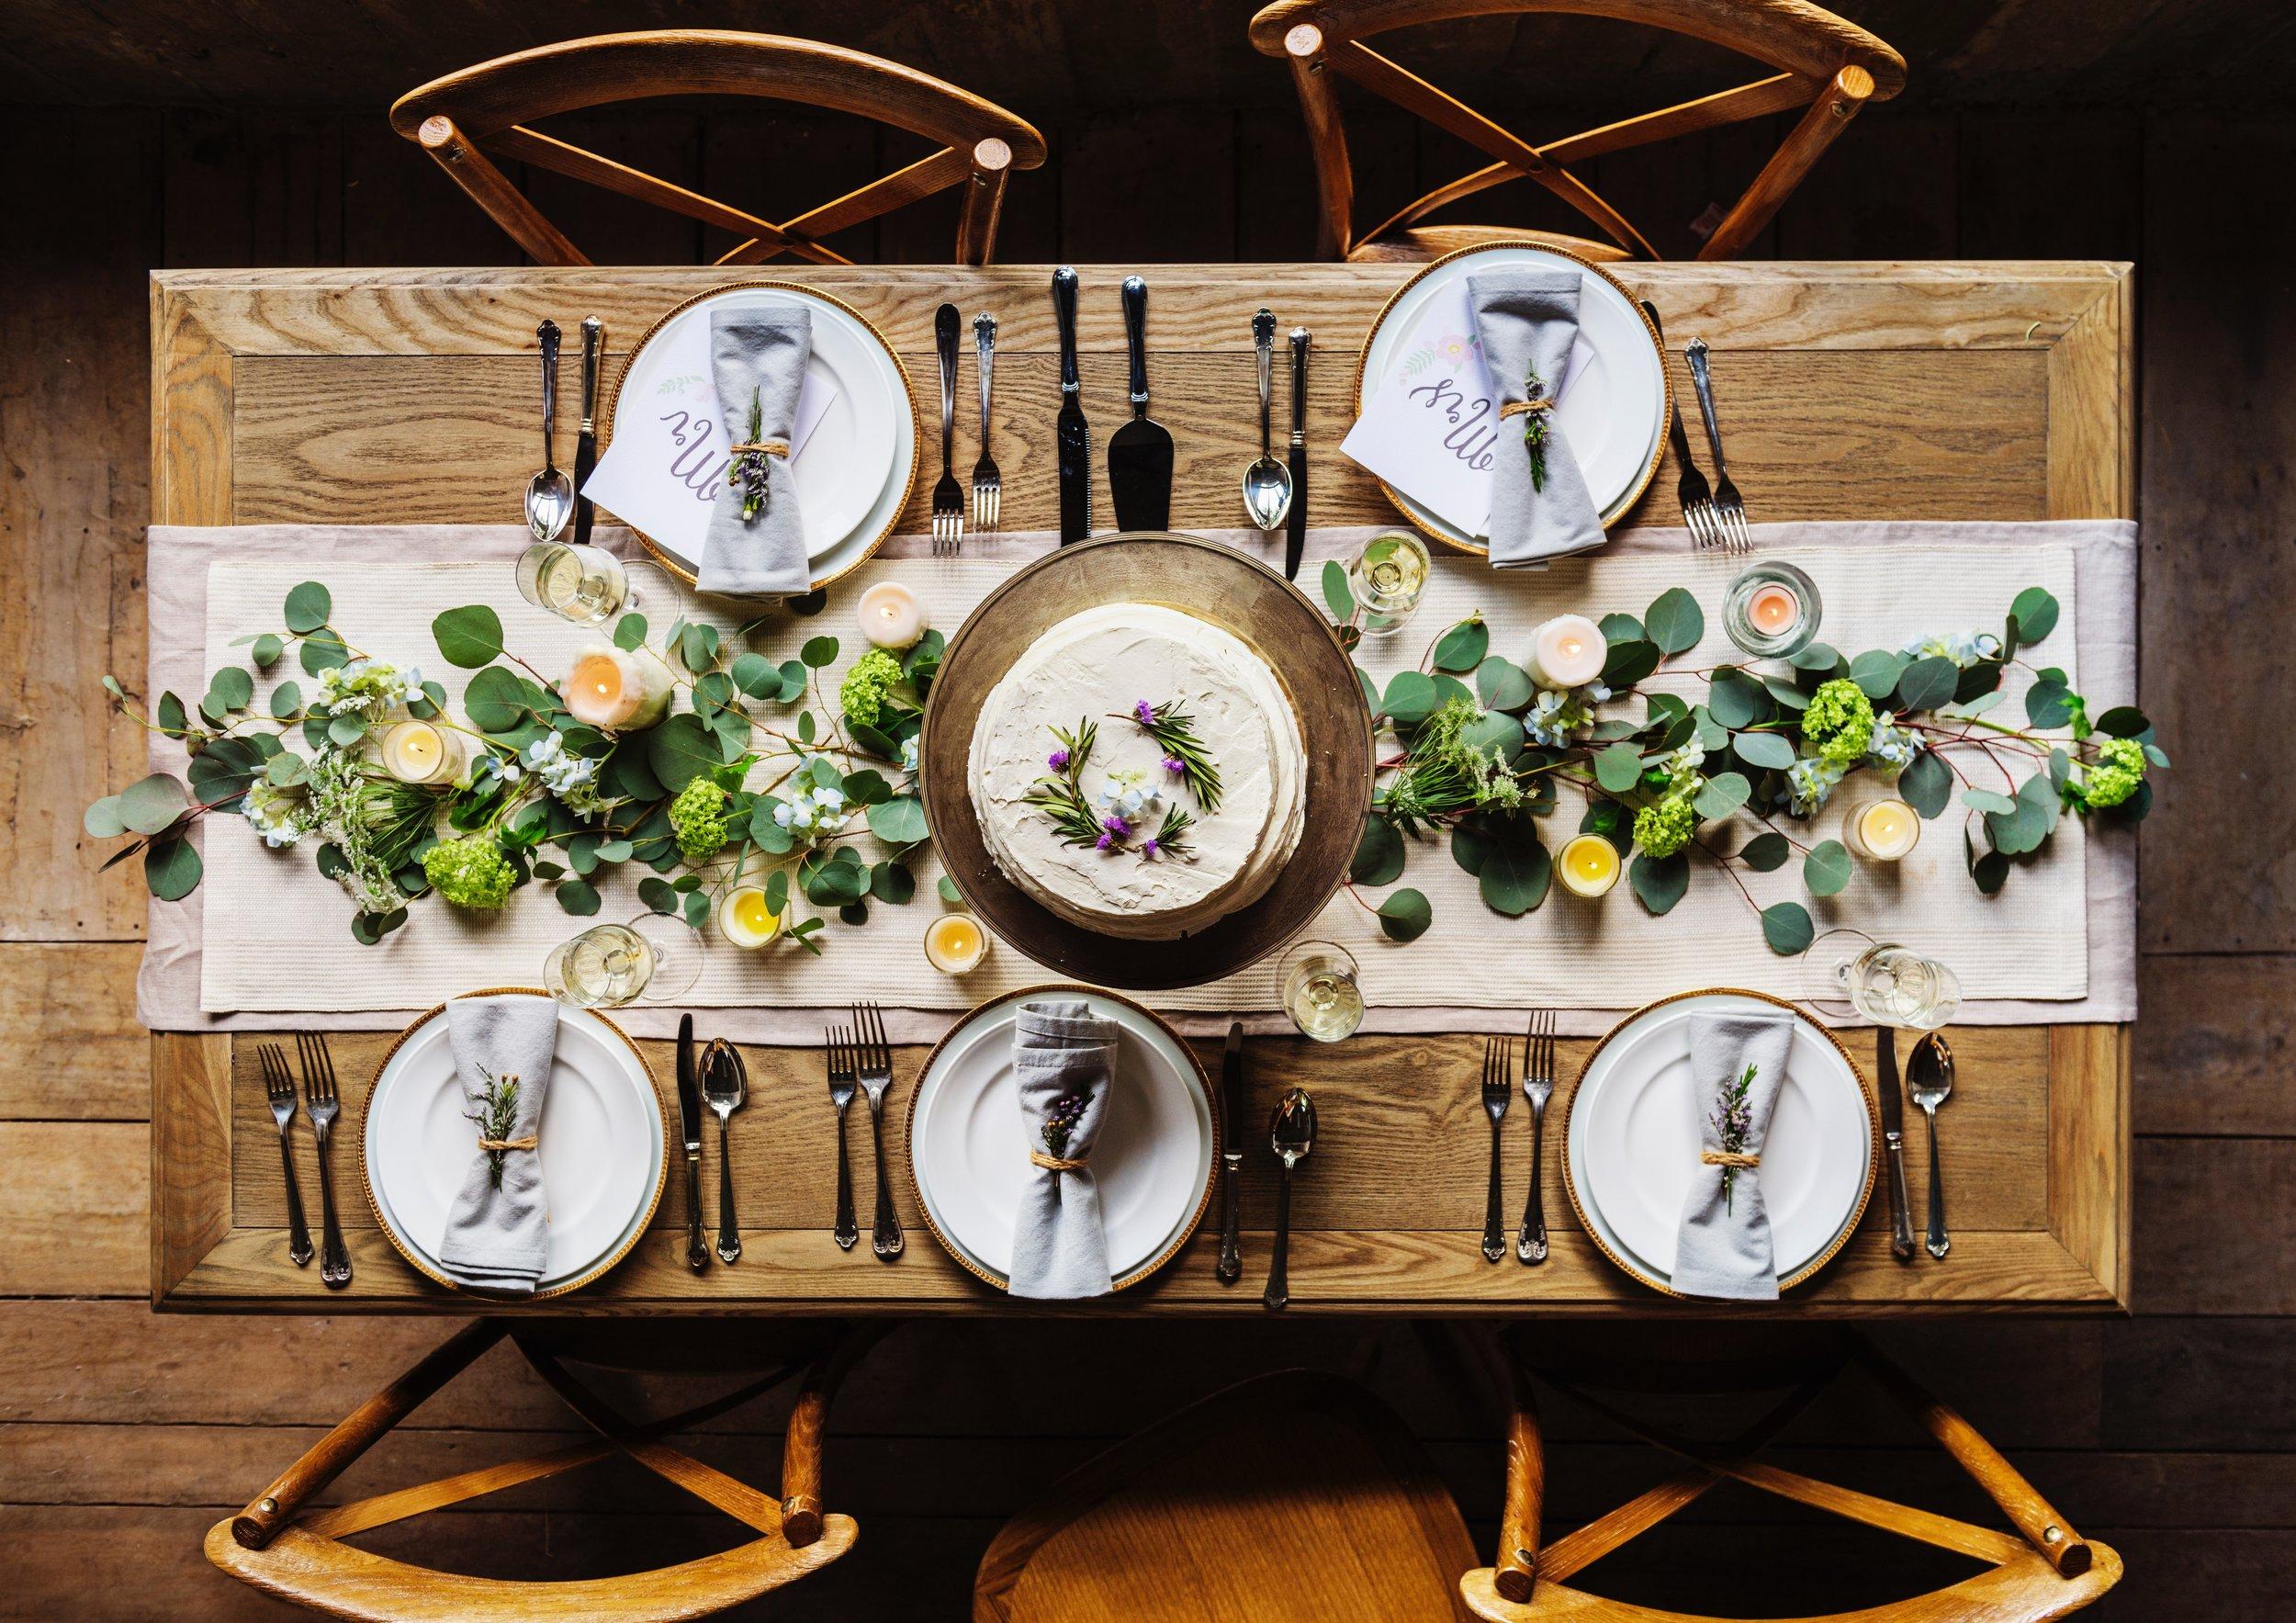 cake-chairs-cutlery-395134.jpg